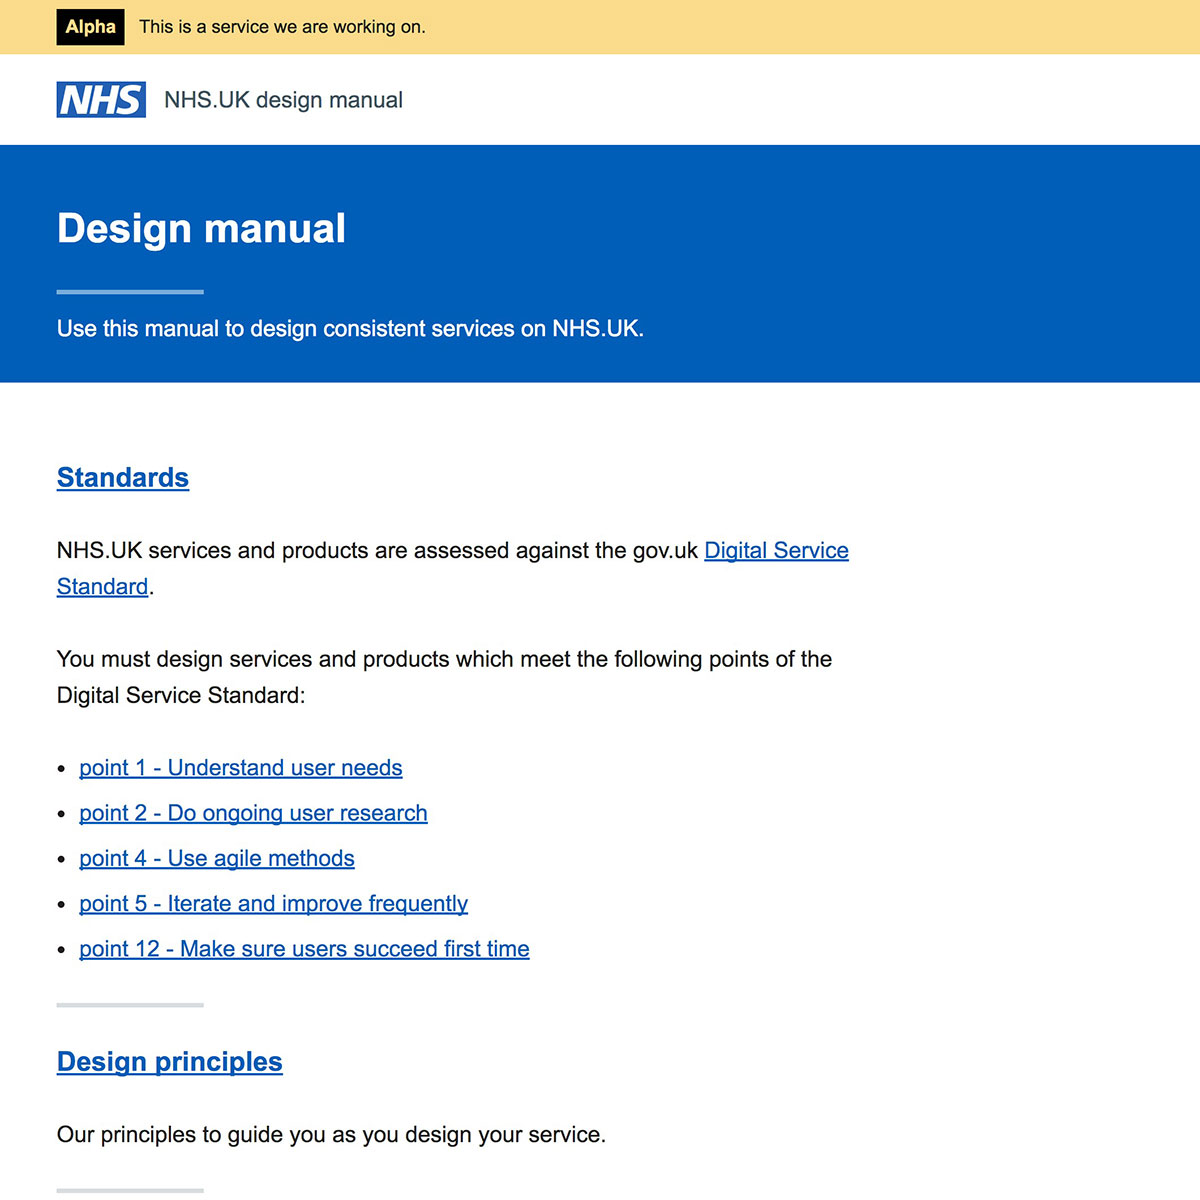 The design manual